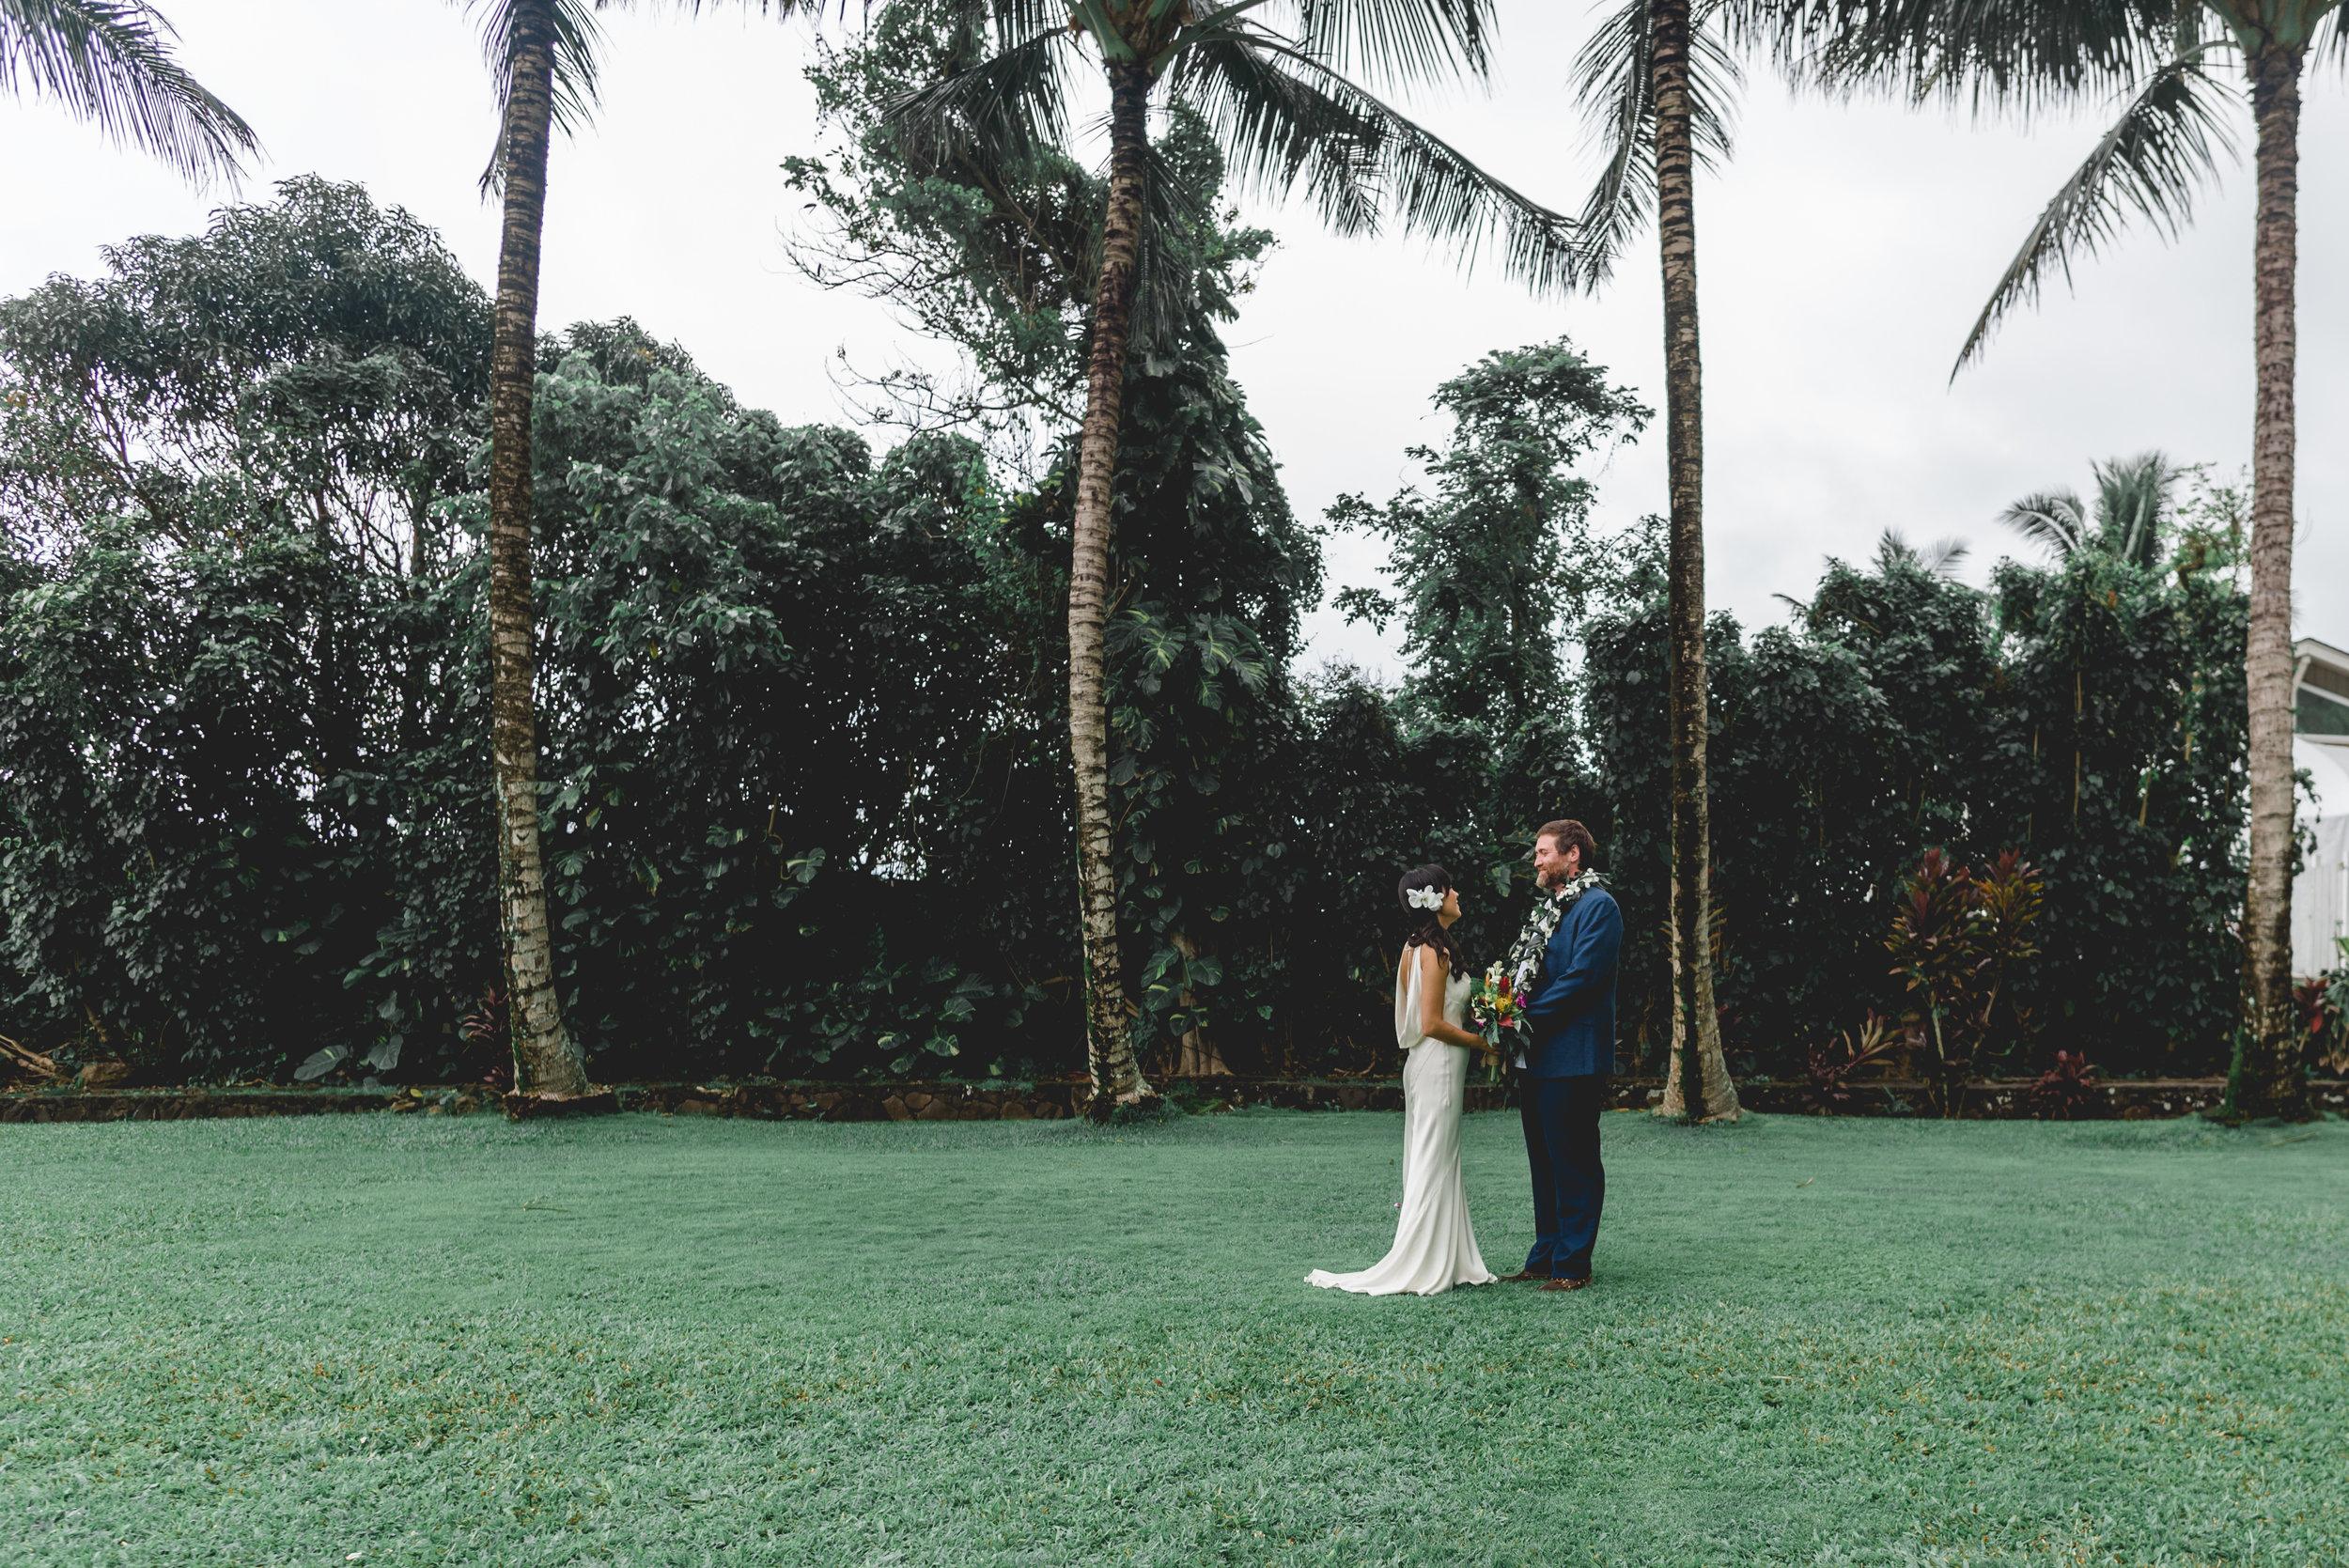 Oahu-Hawaii-wedding-couple-49.jpg